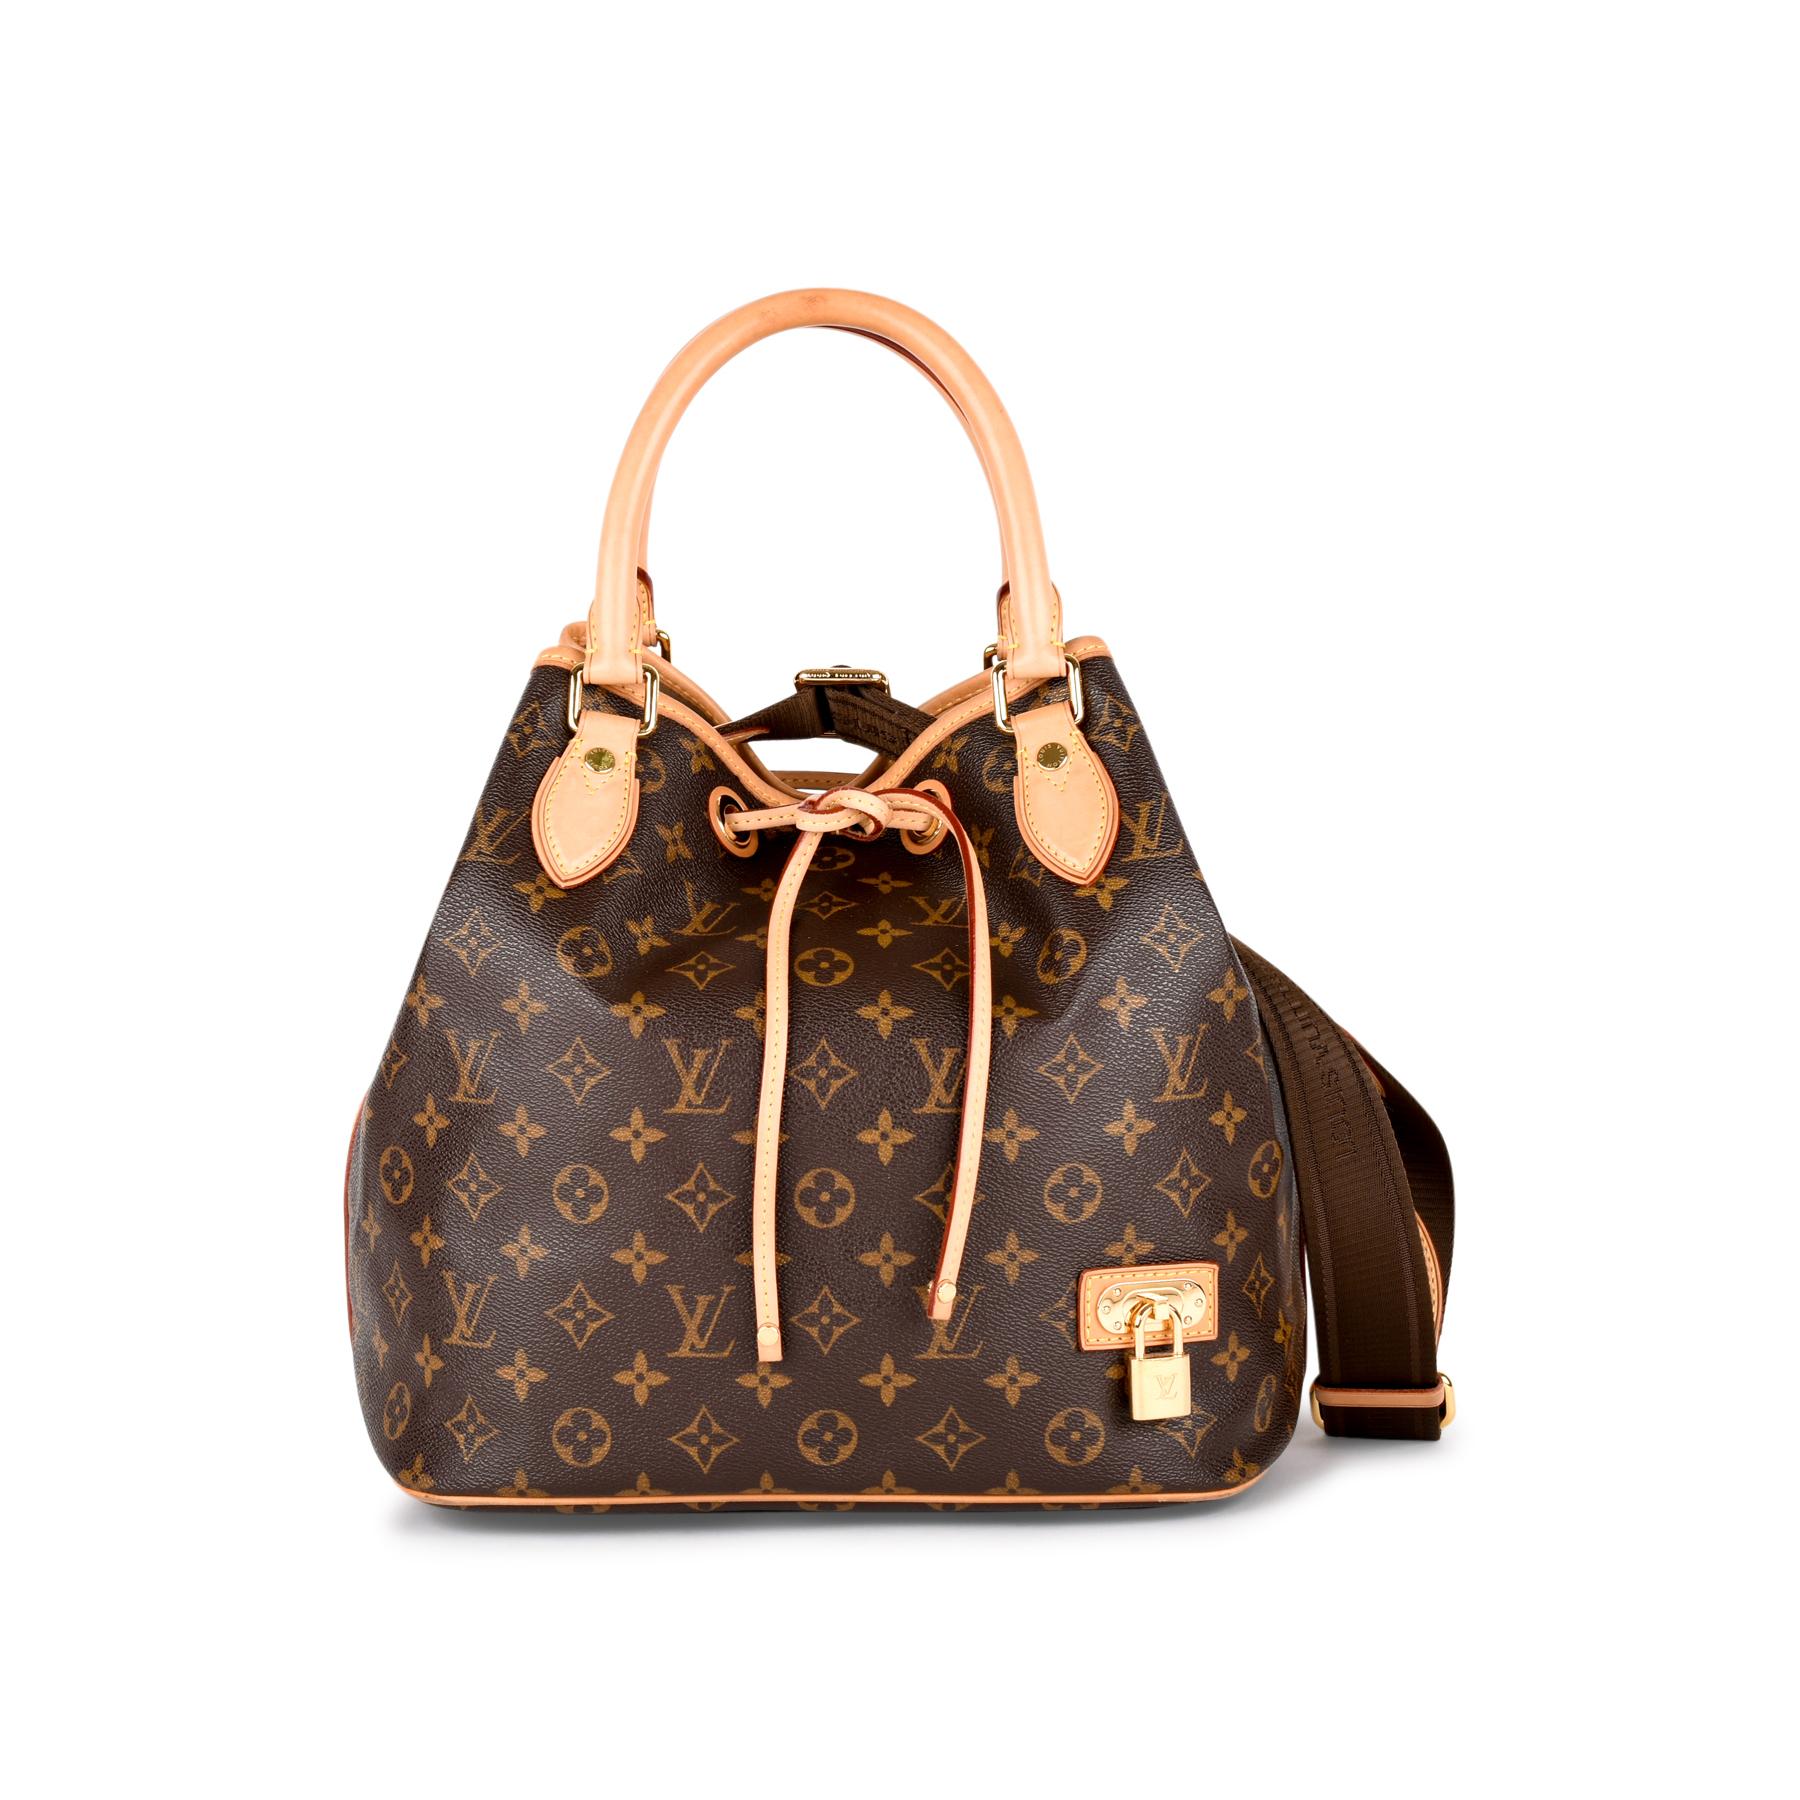 4e3a8f381b0e Authentic Second Hand Louis Vuitton Neo Bucket Tote (PSS-451-00001 ...